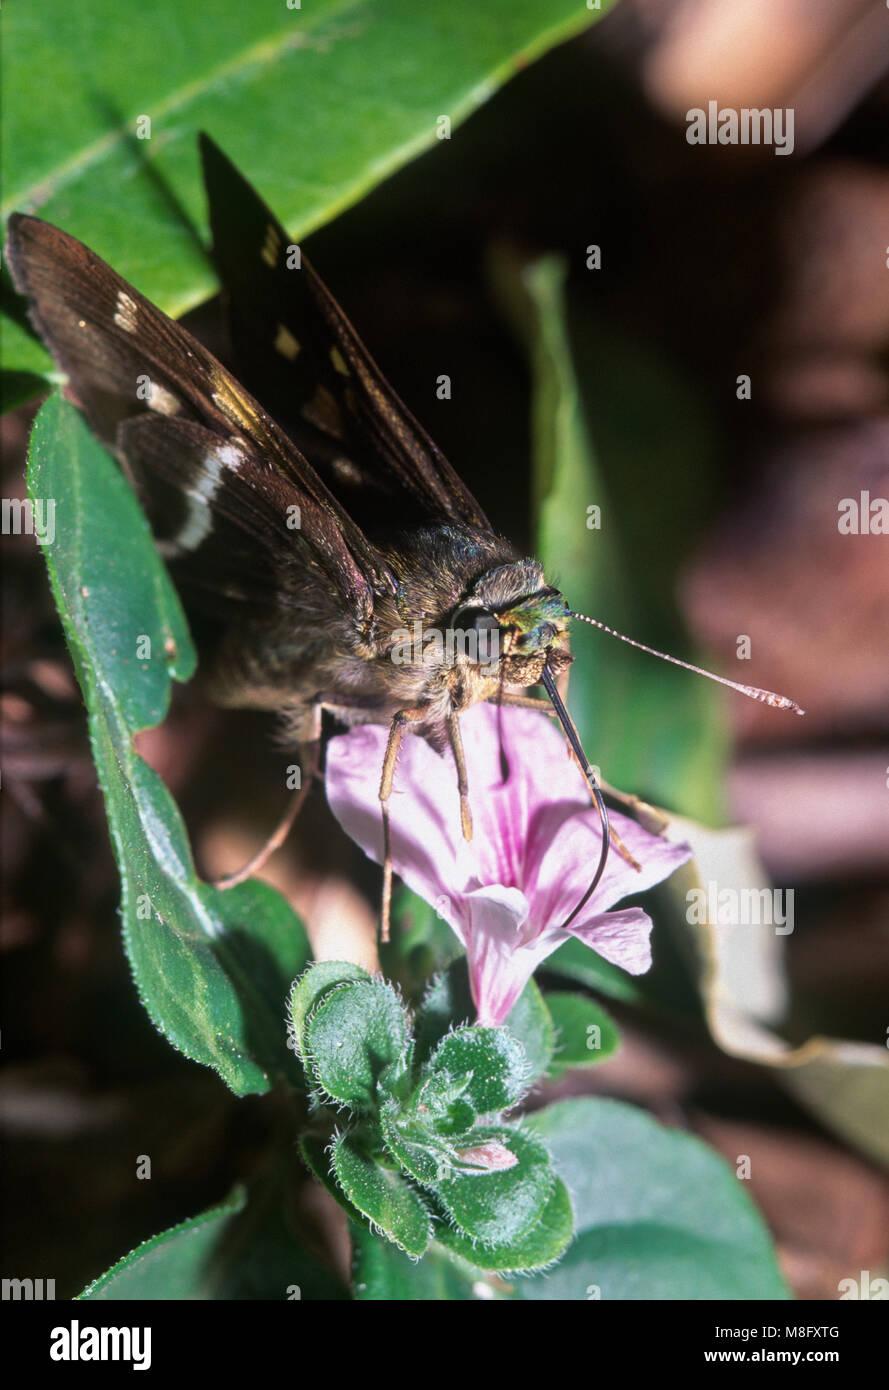 Tropical skipper butterfly (Hesperiidae) feeding on pink flower, Foz do Iguacu, Brazil - Stock Image